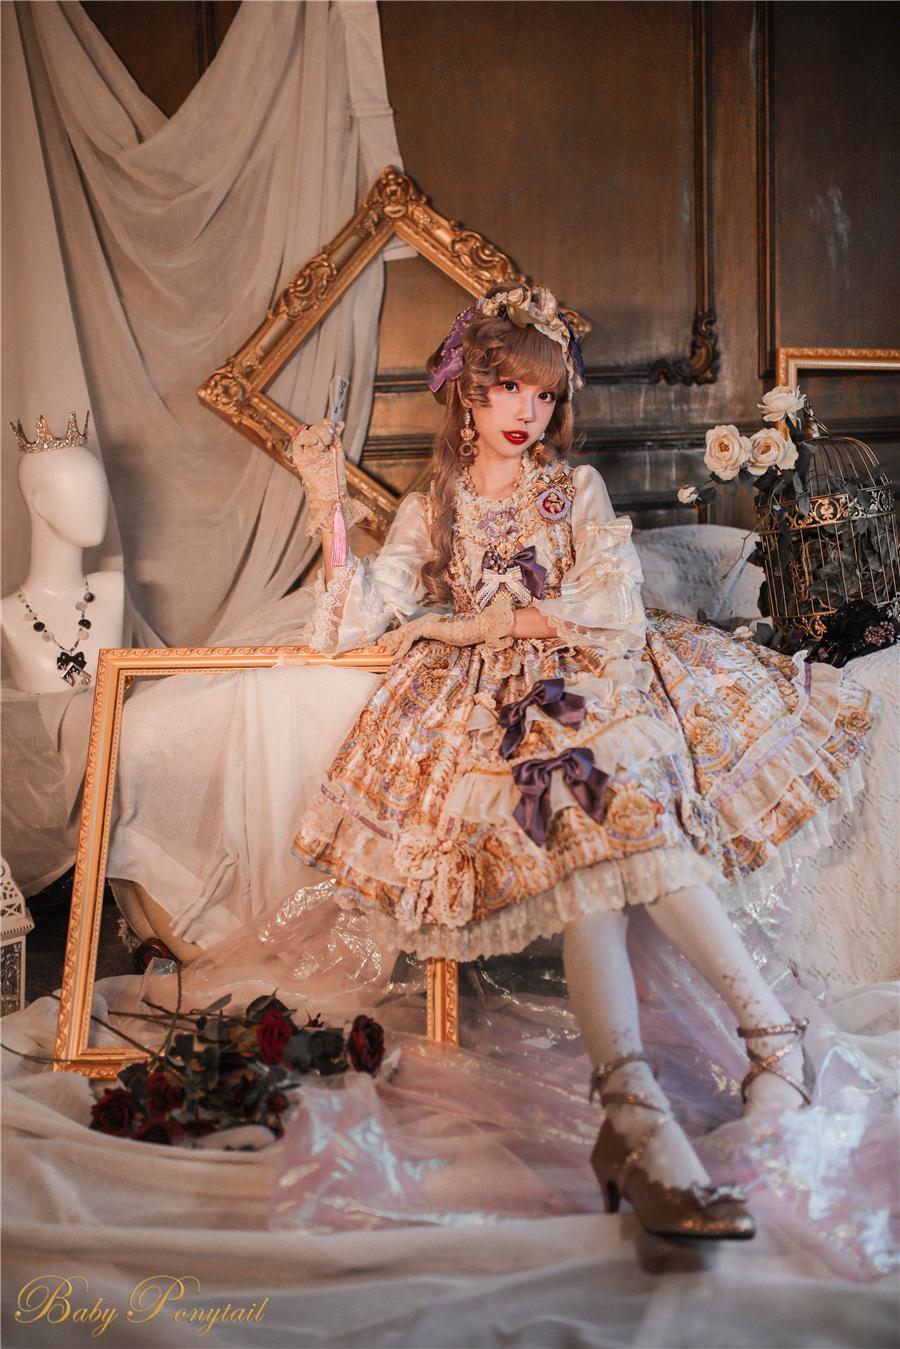 Babyponytail_Model_JSK_Purple Present Angel_Kaka_22.jpg